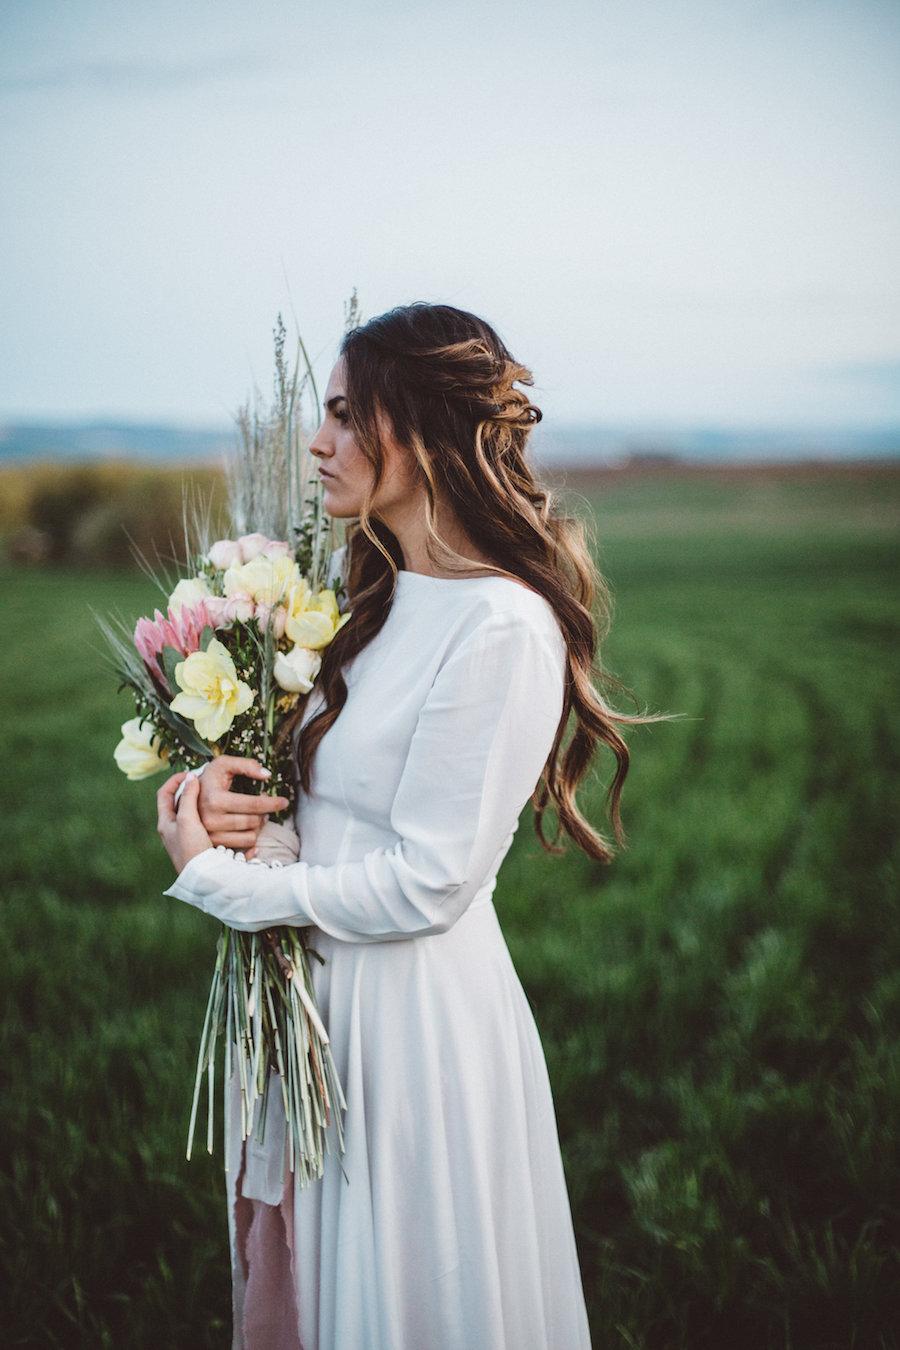 Romantic-Prairie-Inspiration-Shoot-J.M.Hunter-Photography-Bridal-Musings-Wedding-Blog-43